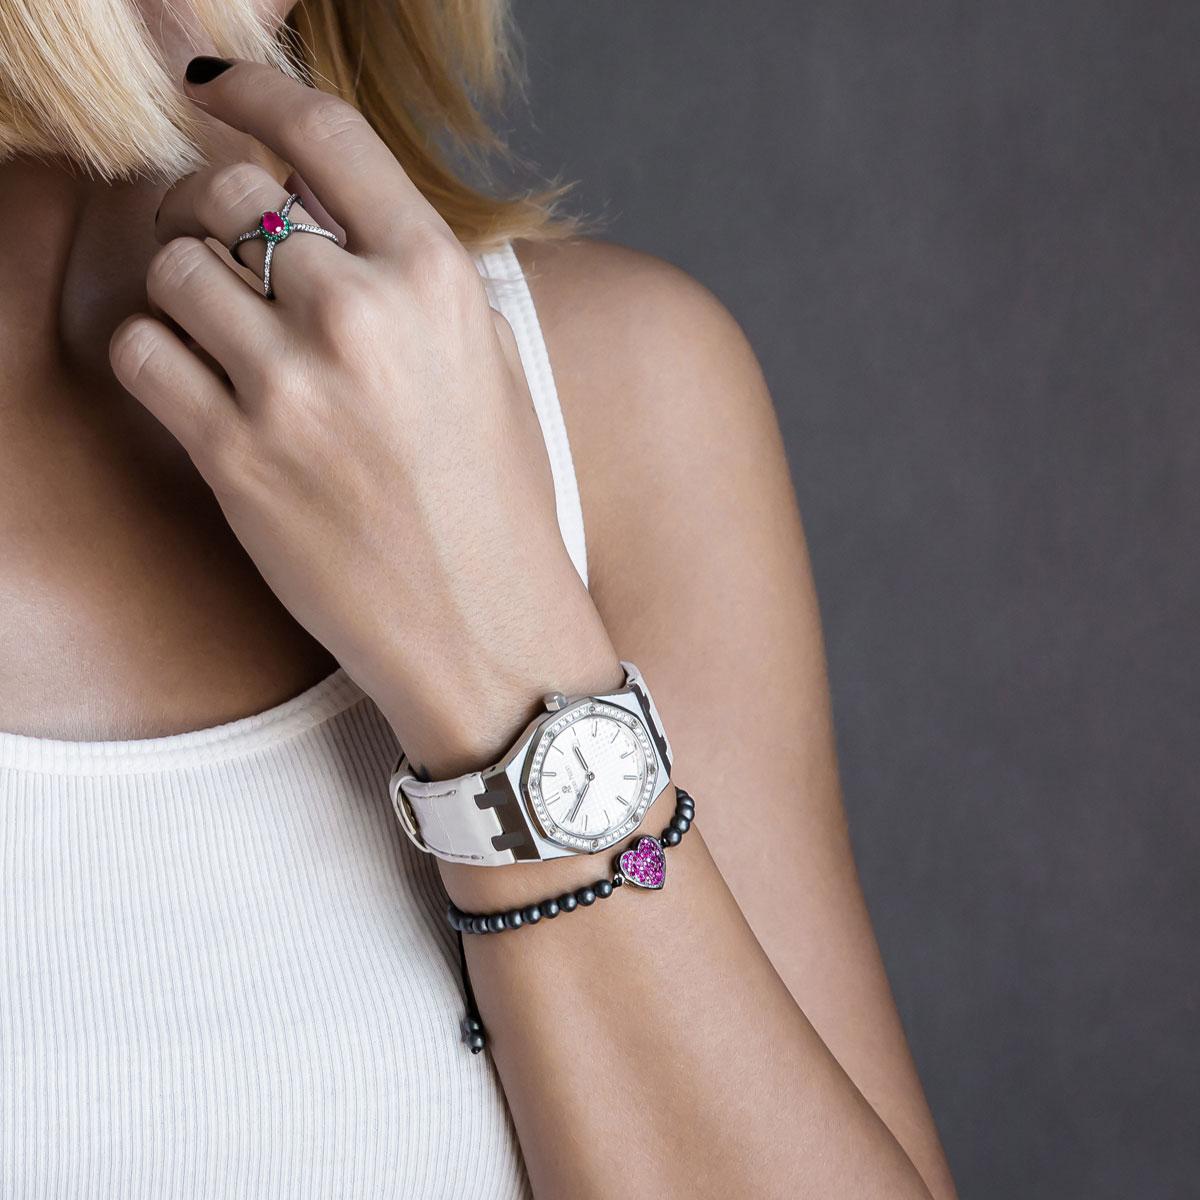 دستبند طلا Black Heart 2